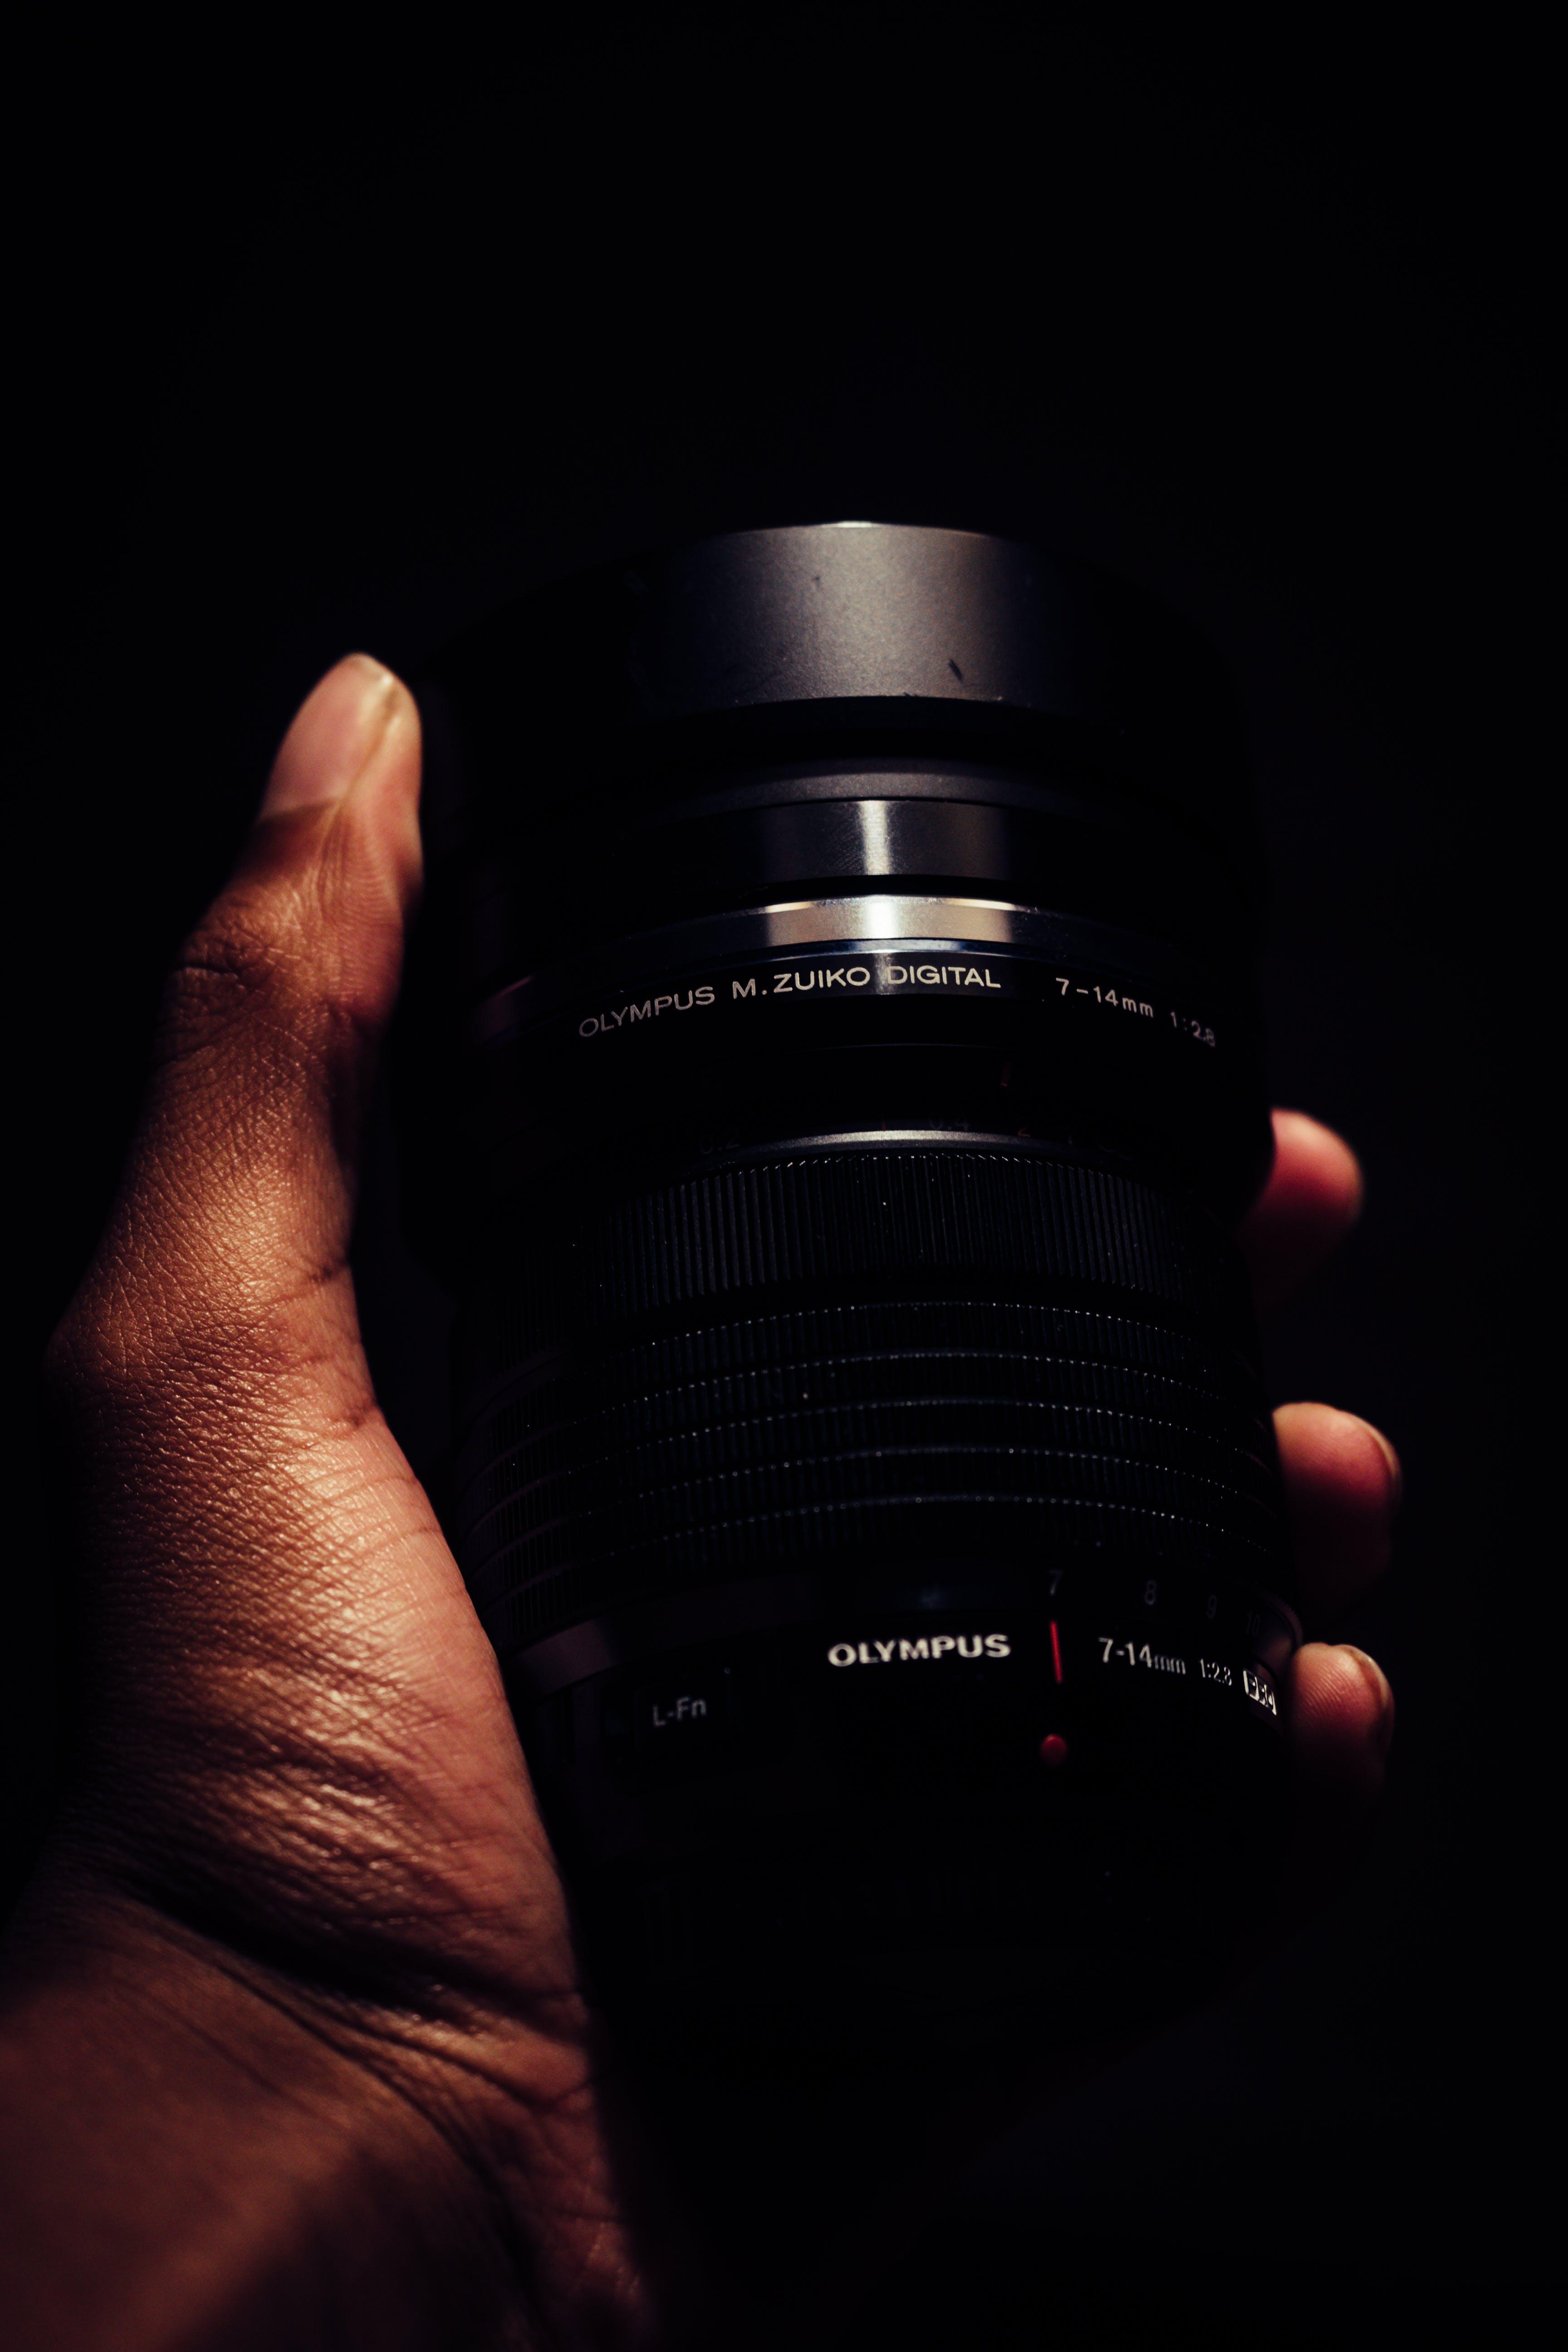 Person Holding Black Olympus Camera Lens